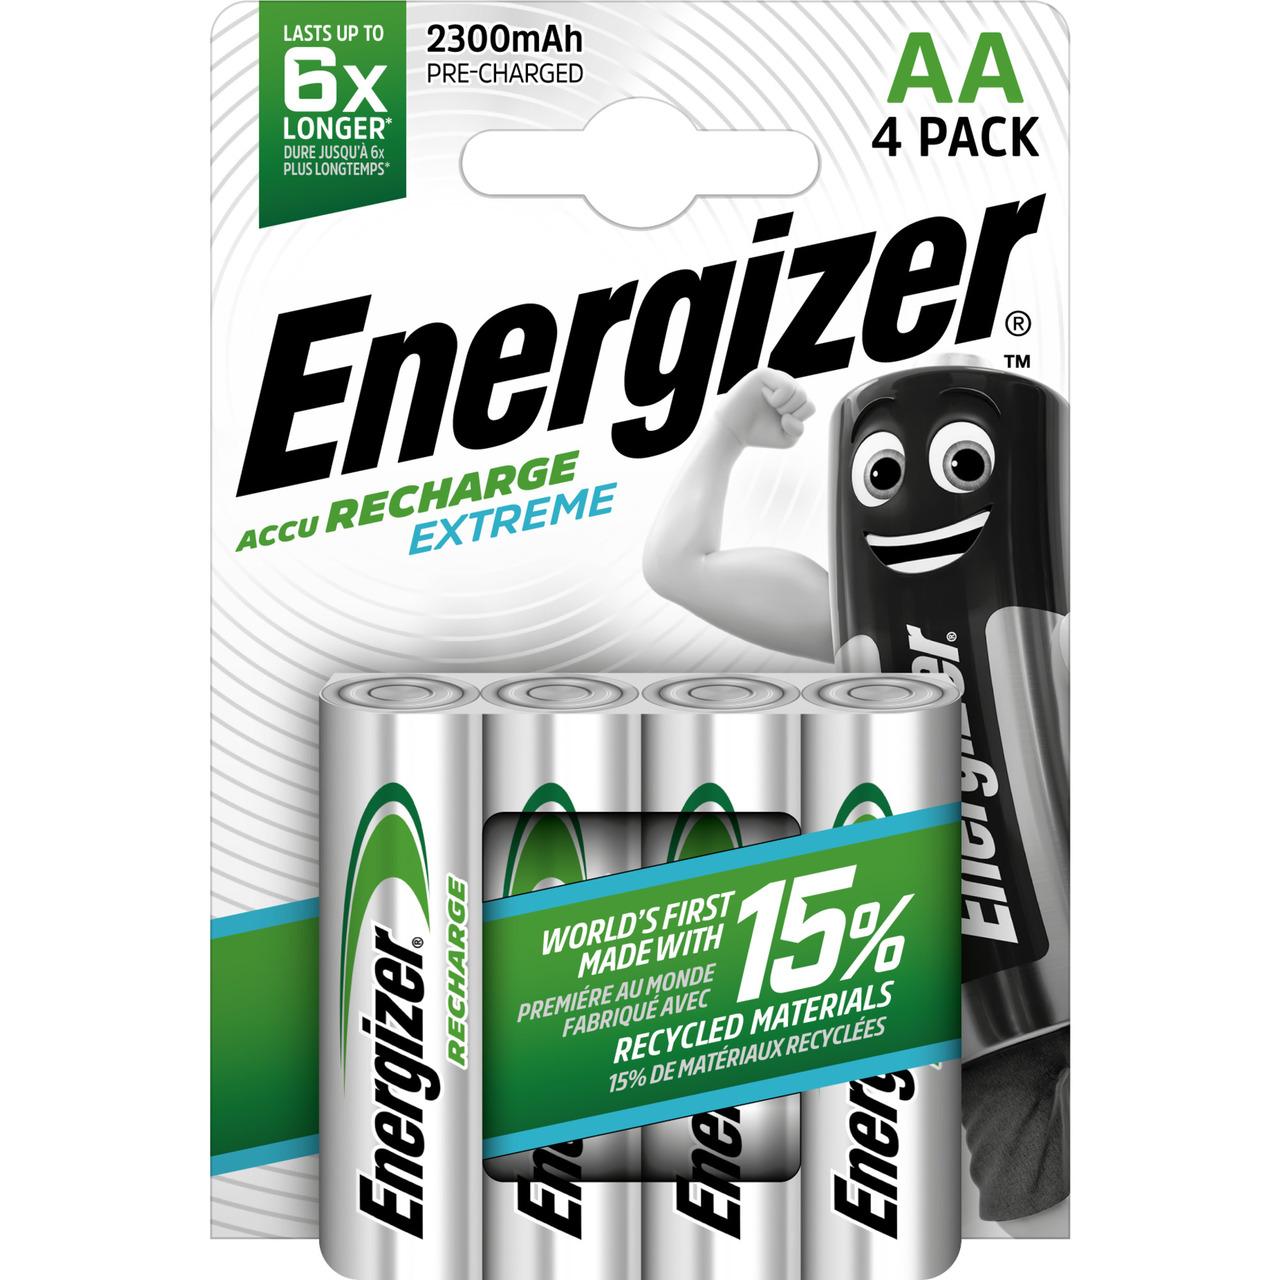 Energizer NiMH-Akku Extreme- Mignon 2300 mAh- vorgeladen 4er Pack